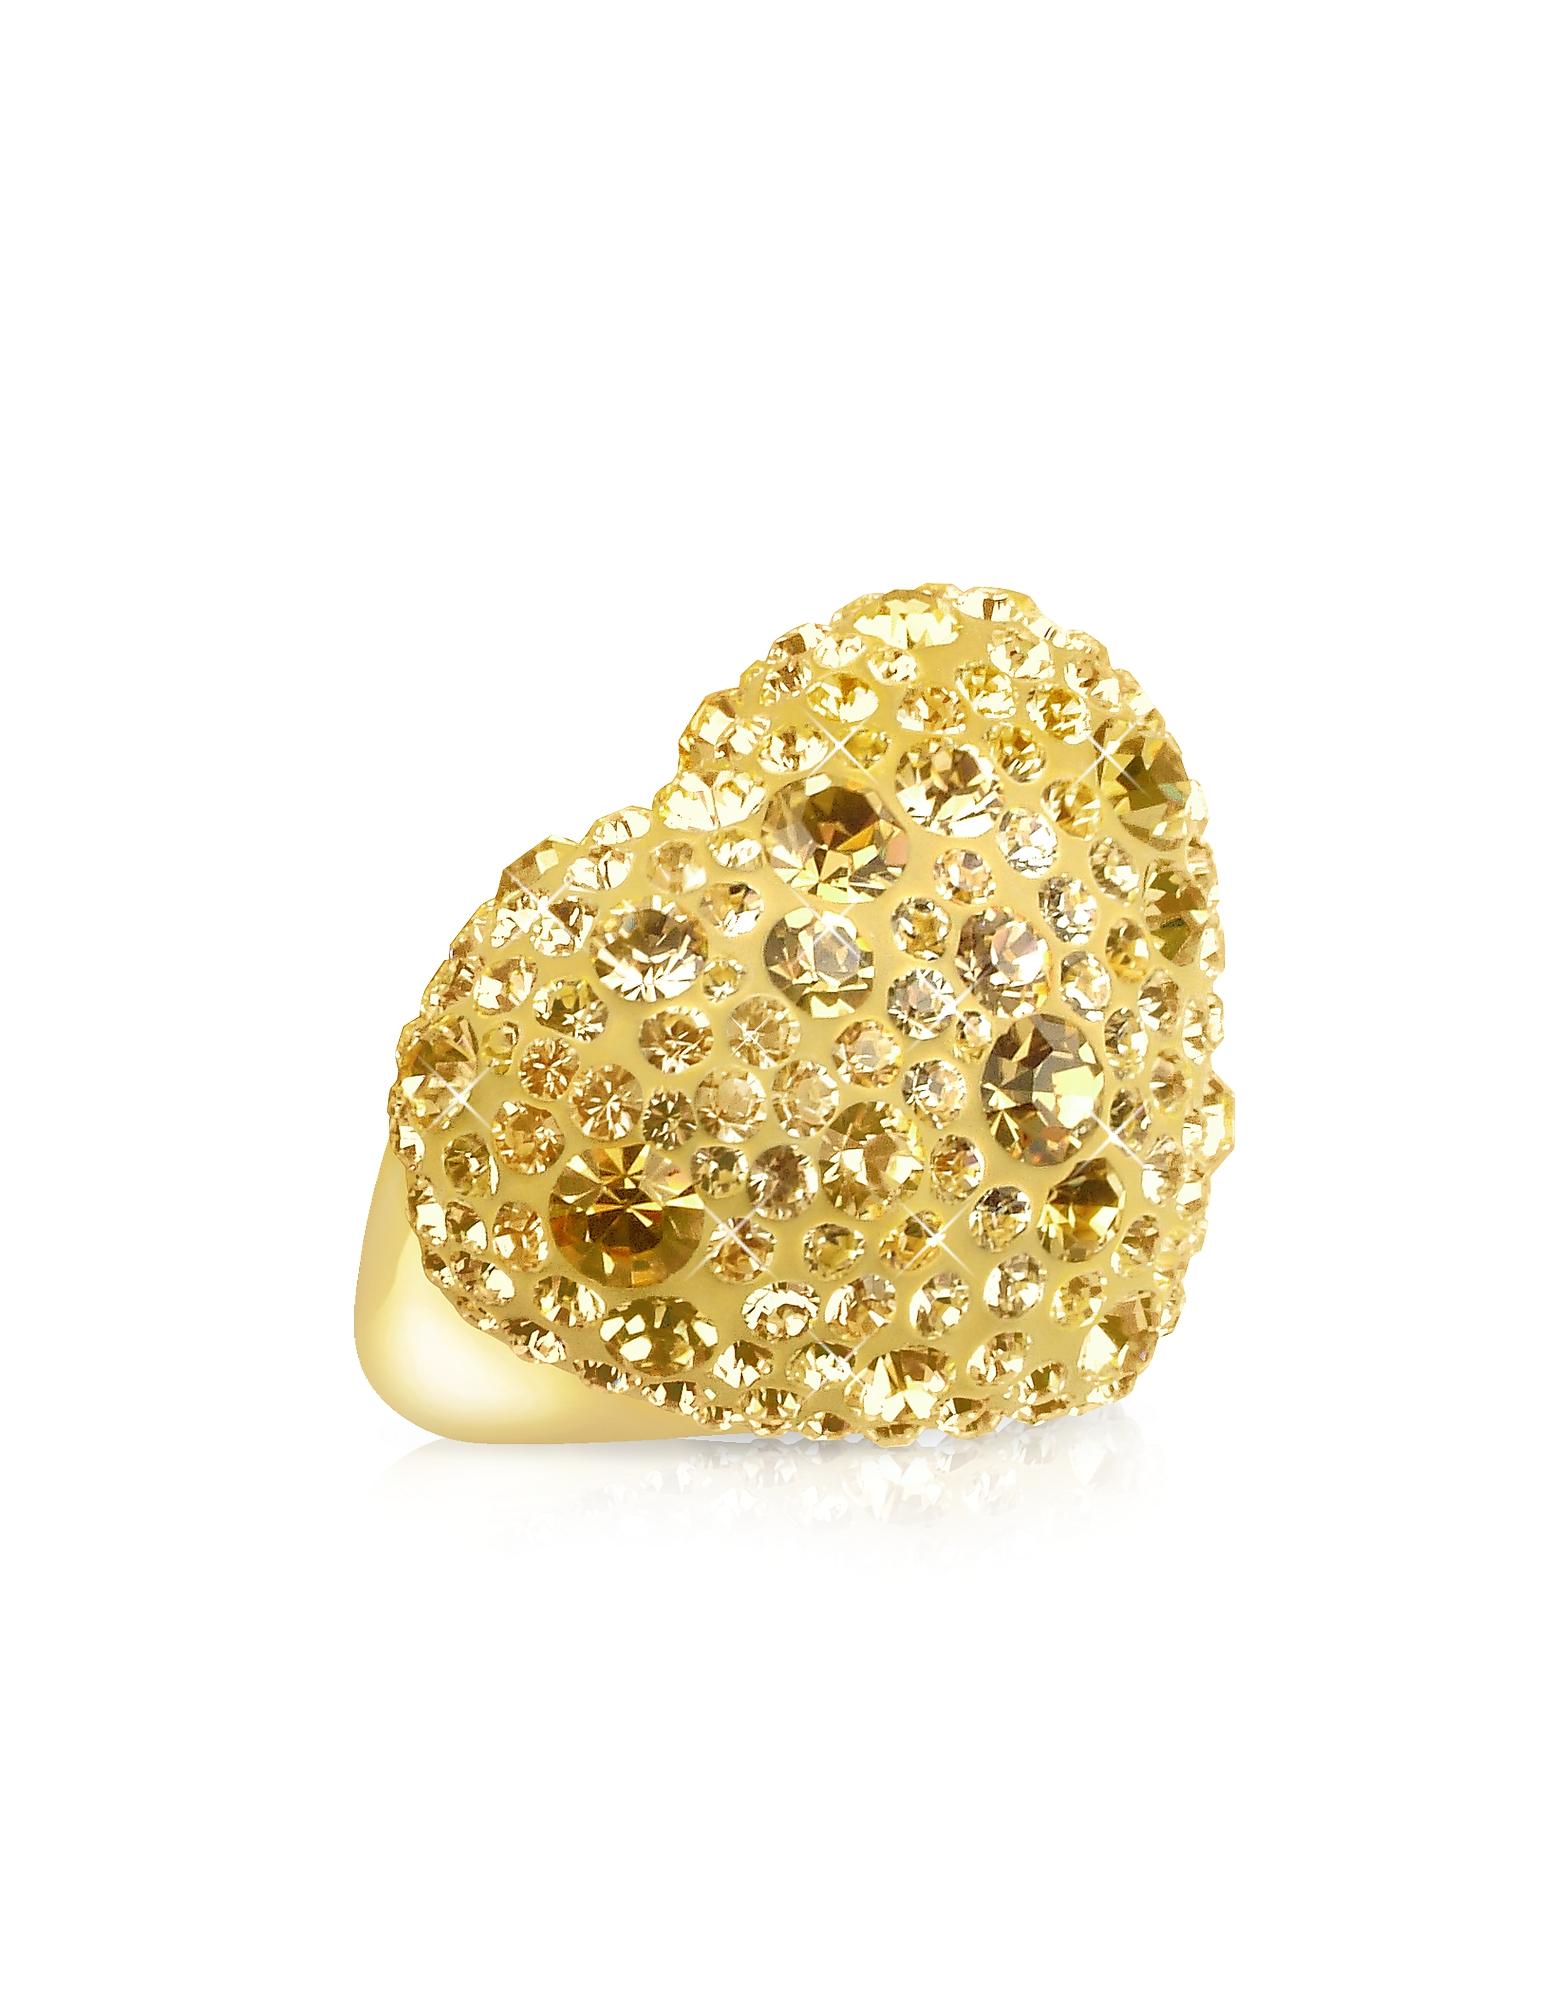 Gisèle St. Moritz Designer Rings, Fantasmania - Gold Crystal Big Heart Ring